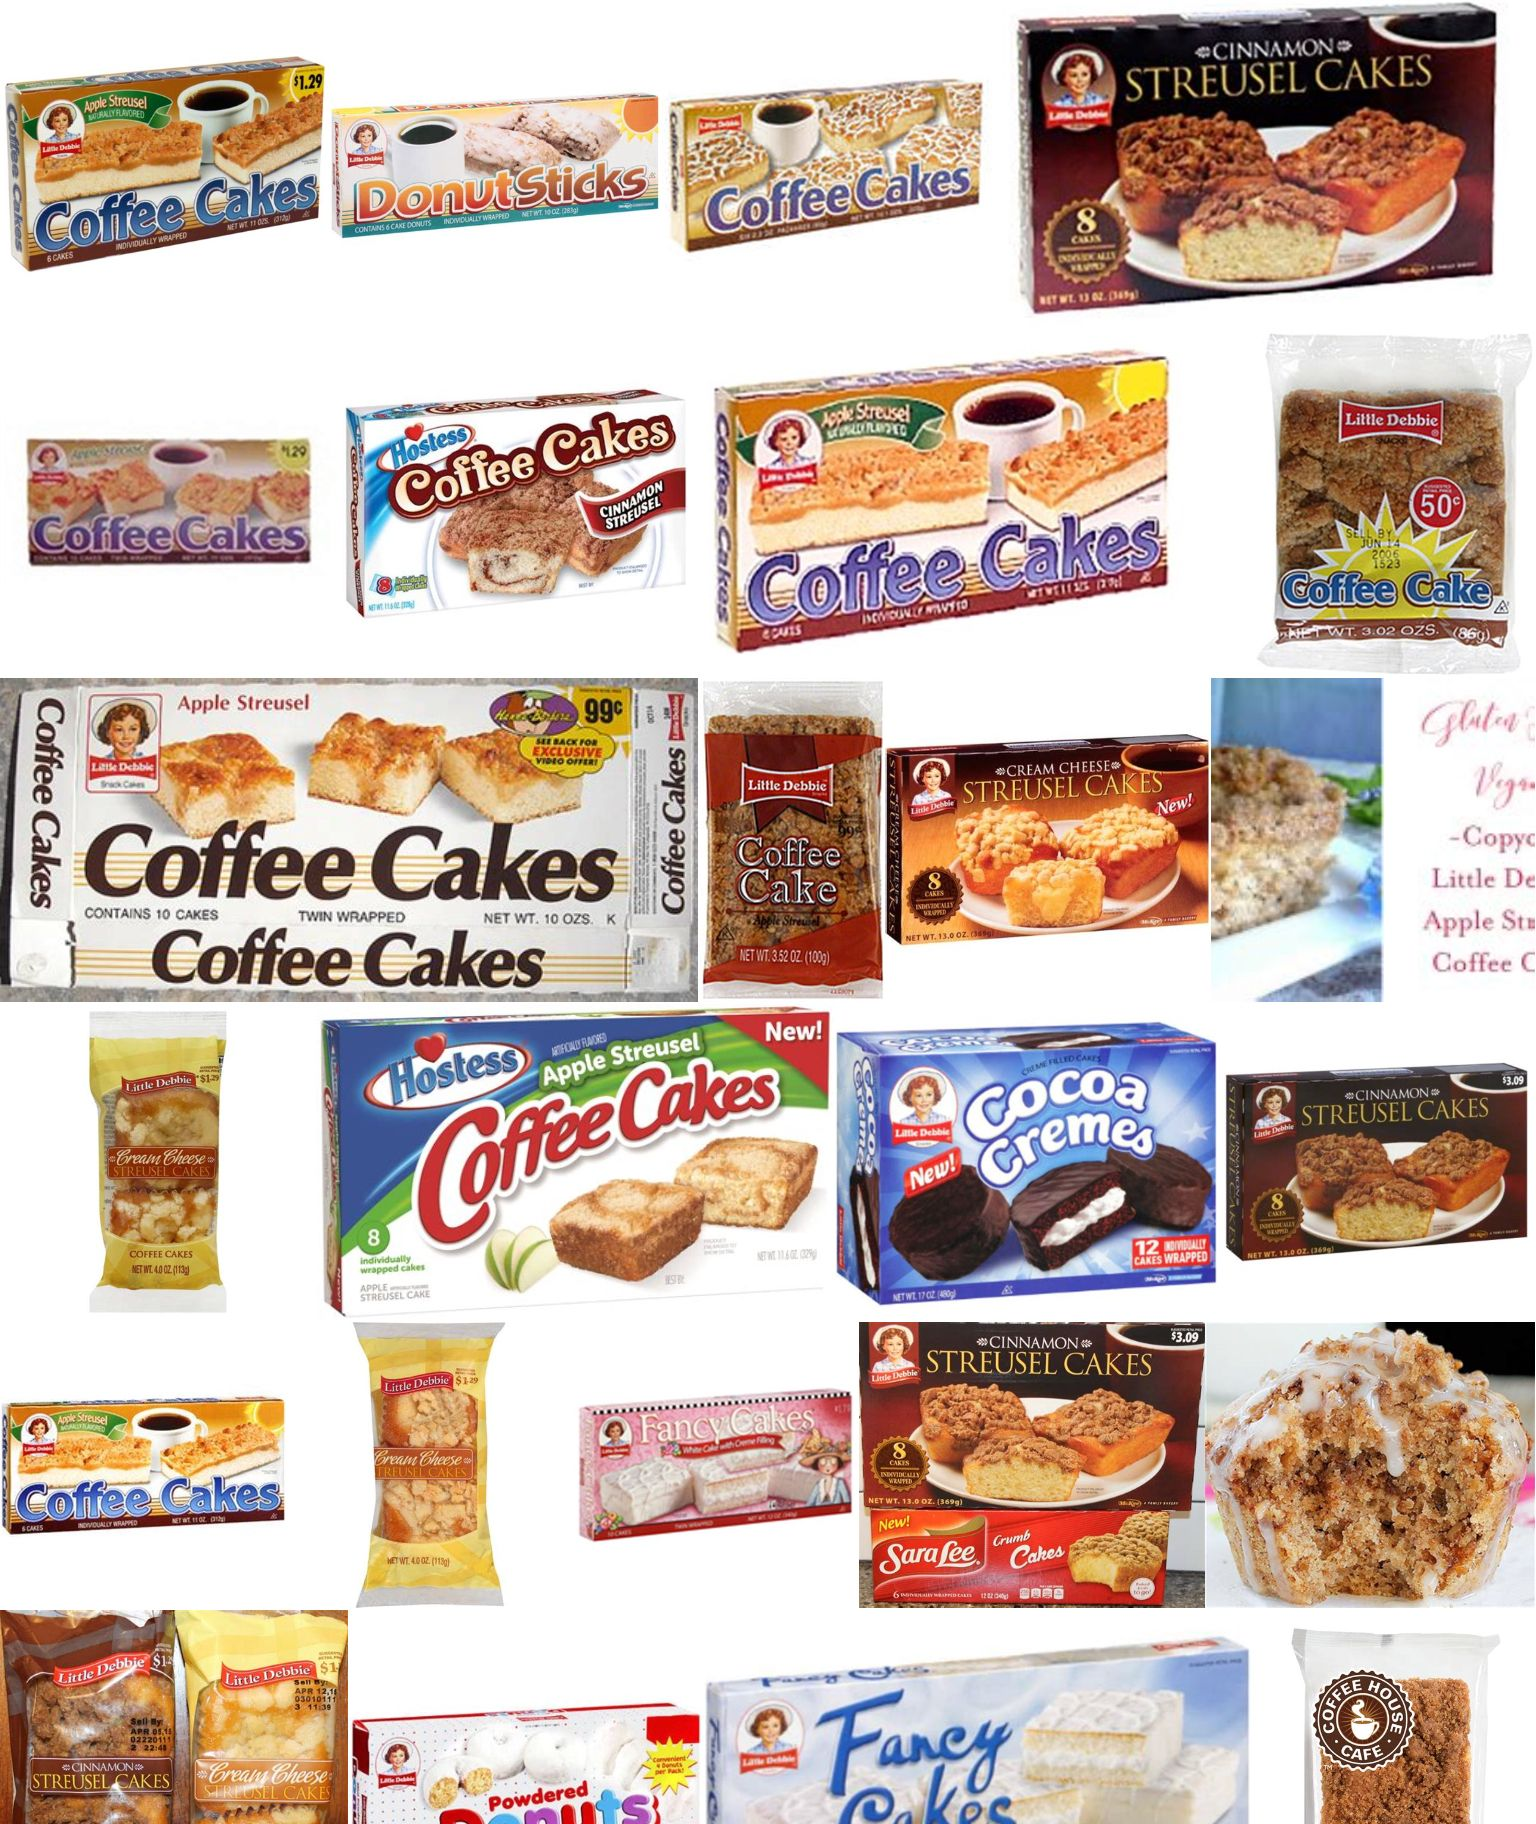 hostess coffee cakes ingredients